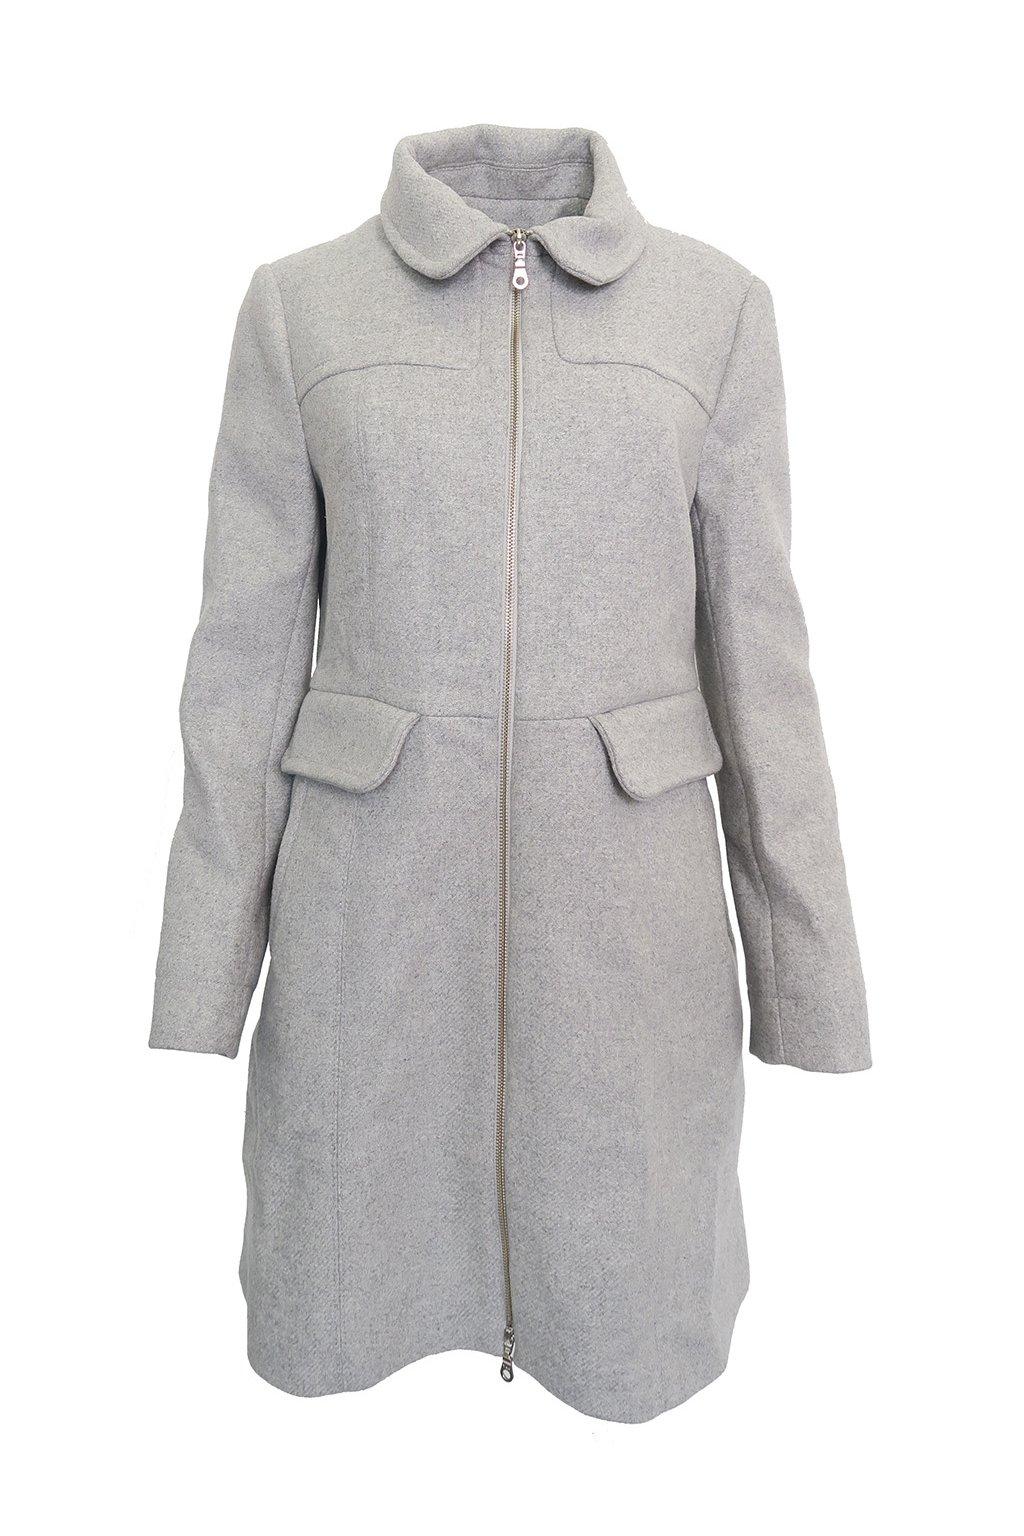 Šedý kabát Kookaï